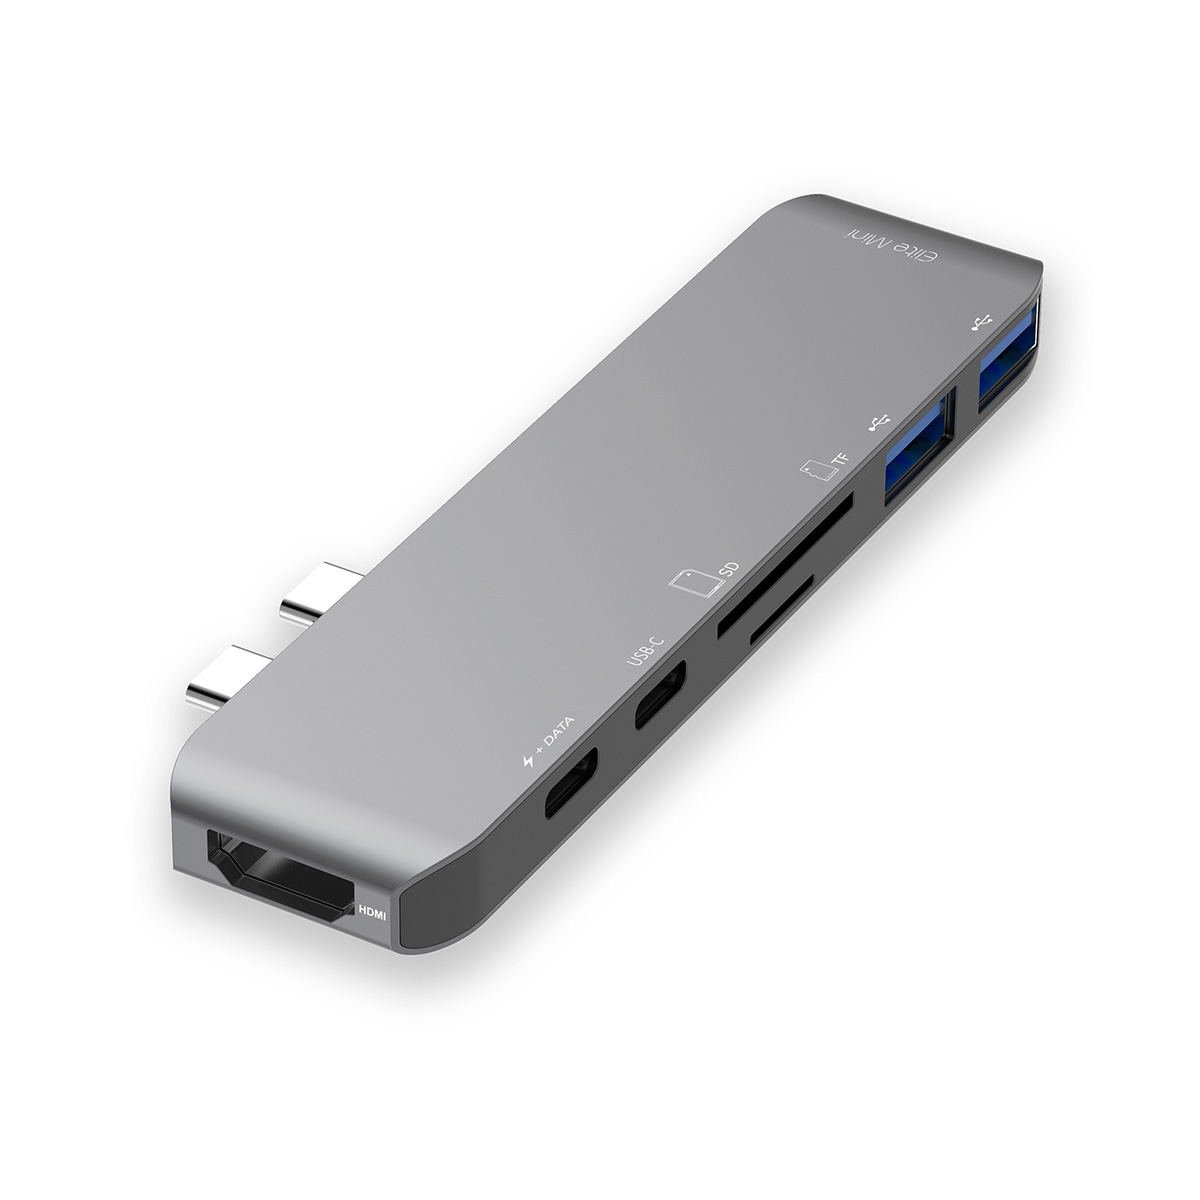 mbeat® 'Elite Mini' USB-C Mini Dock with 4K HDMI, Thurderbolt 3, PD Charging and SD/TF Reader